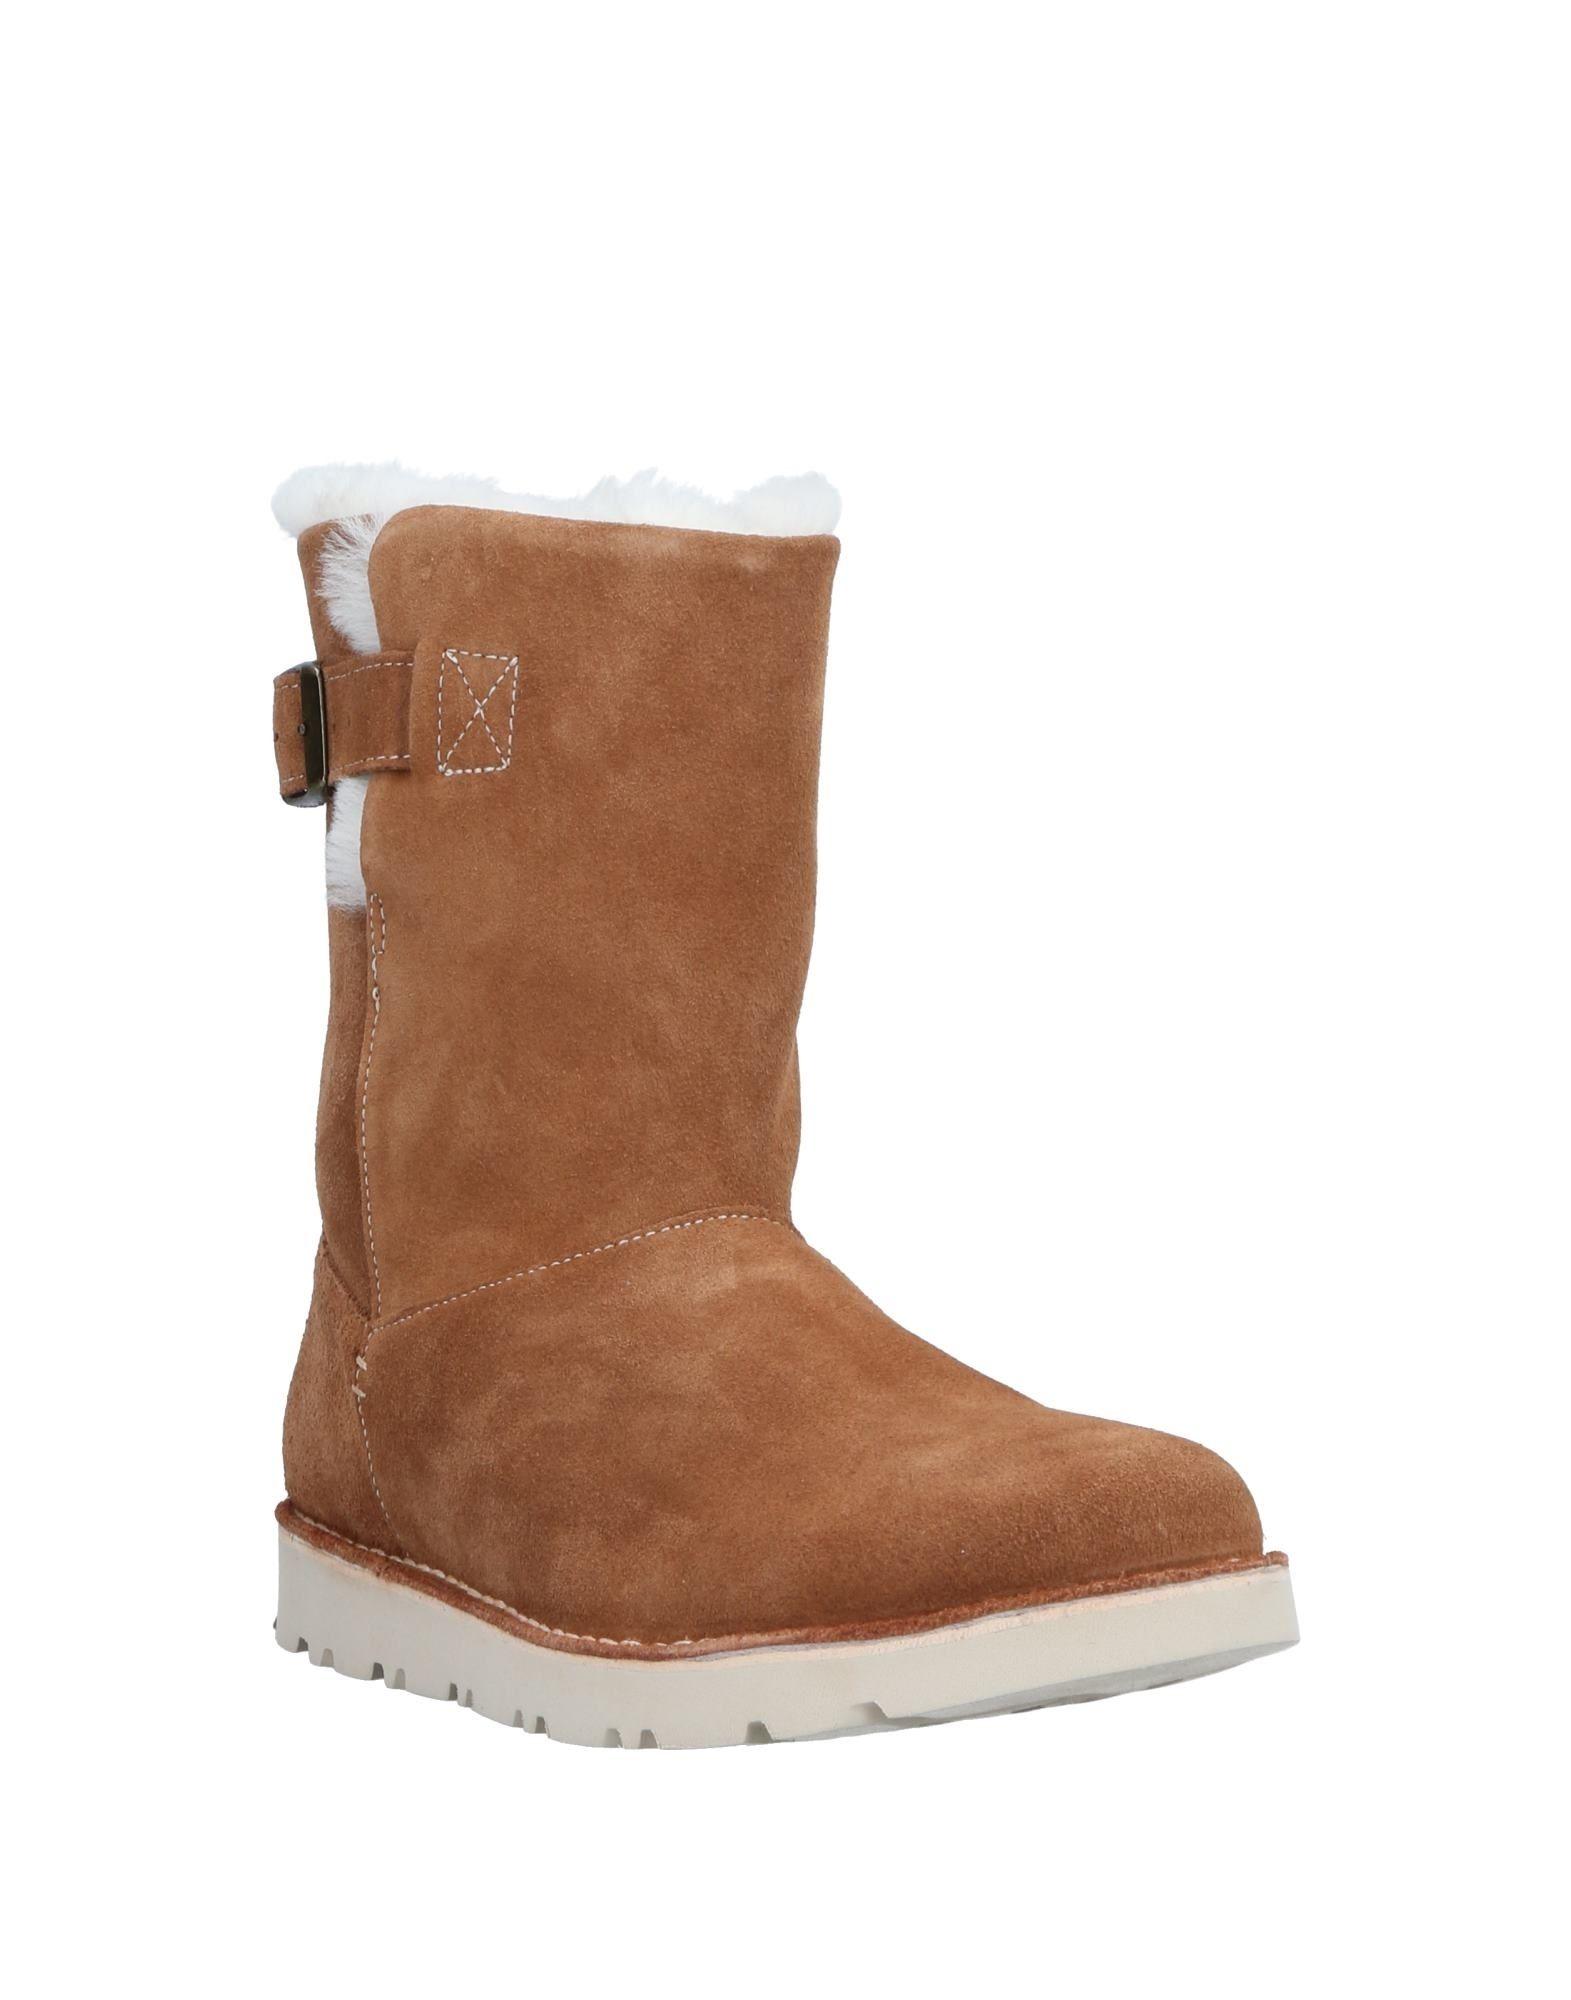 Birkenstock Ankle Boot - Women Birkenstock Ankle Boots online on 11018232DA  Canada - 11018232DA on cdc072